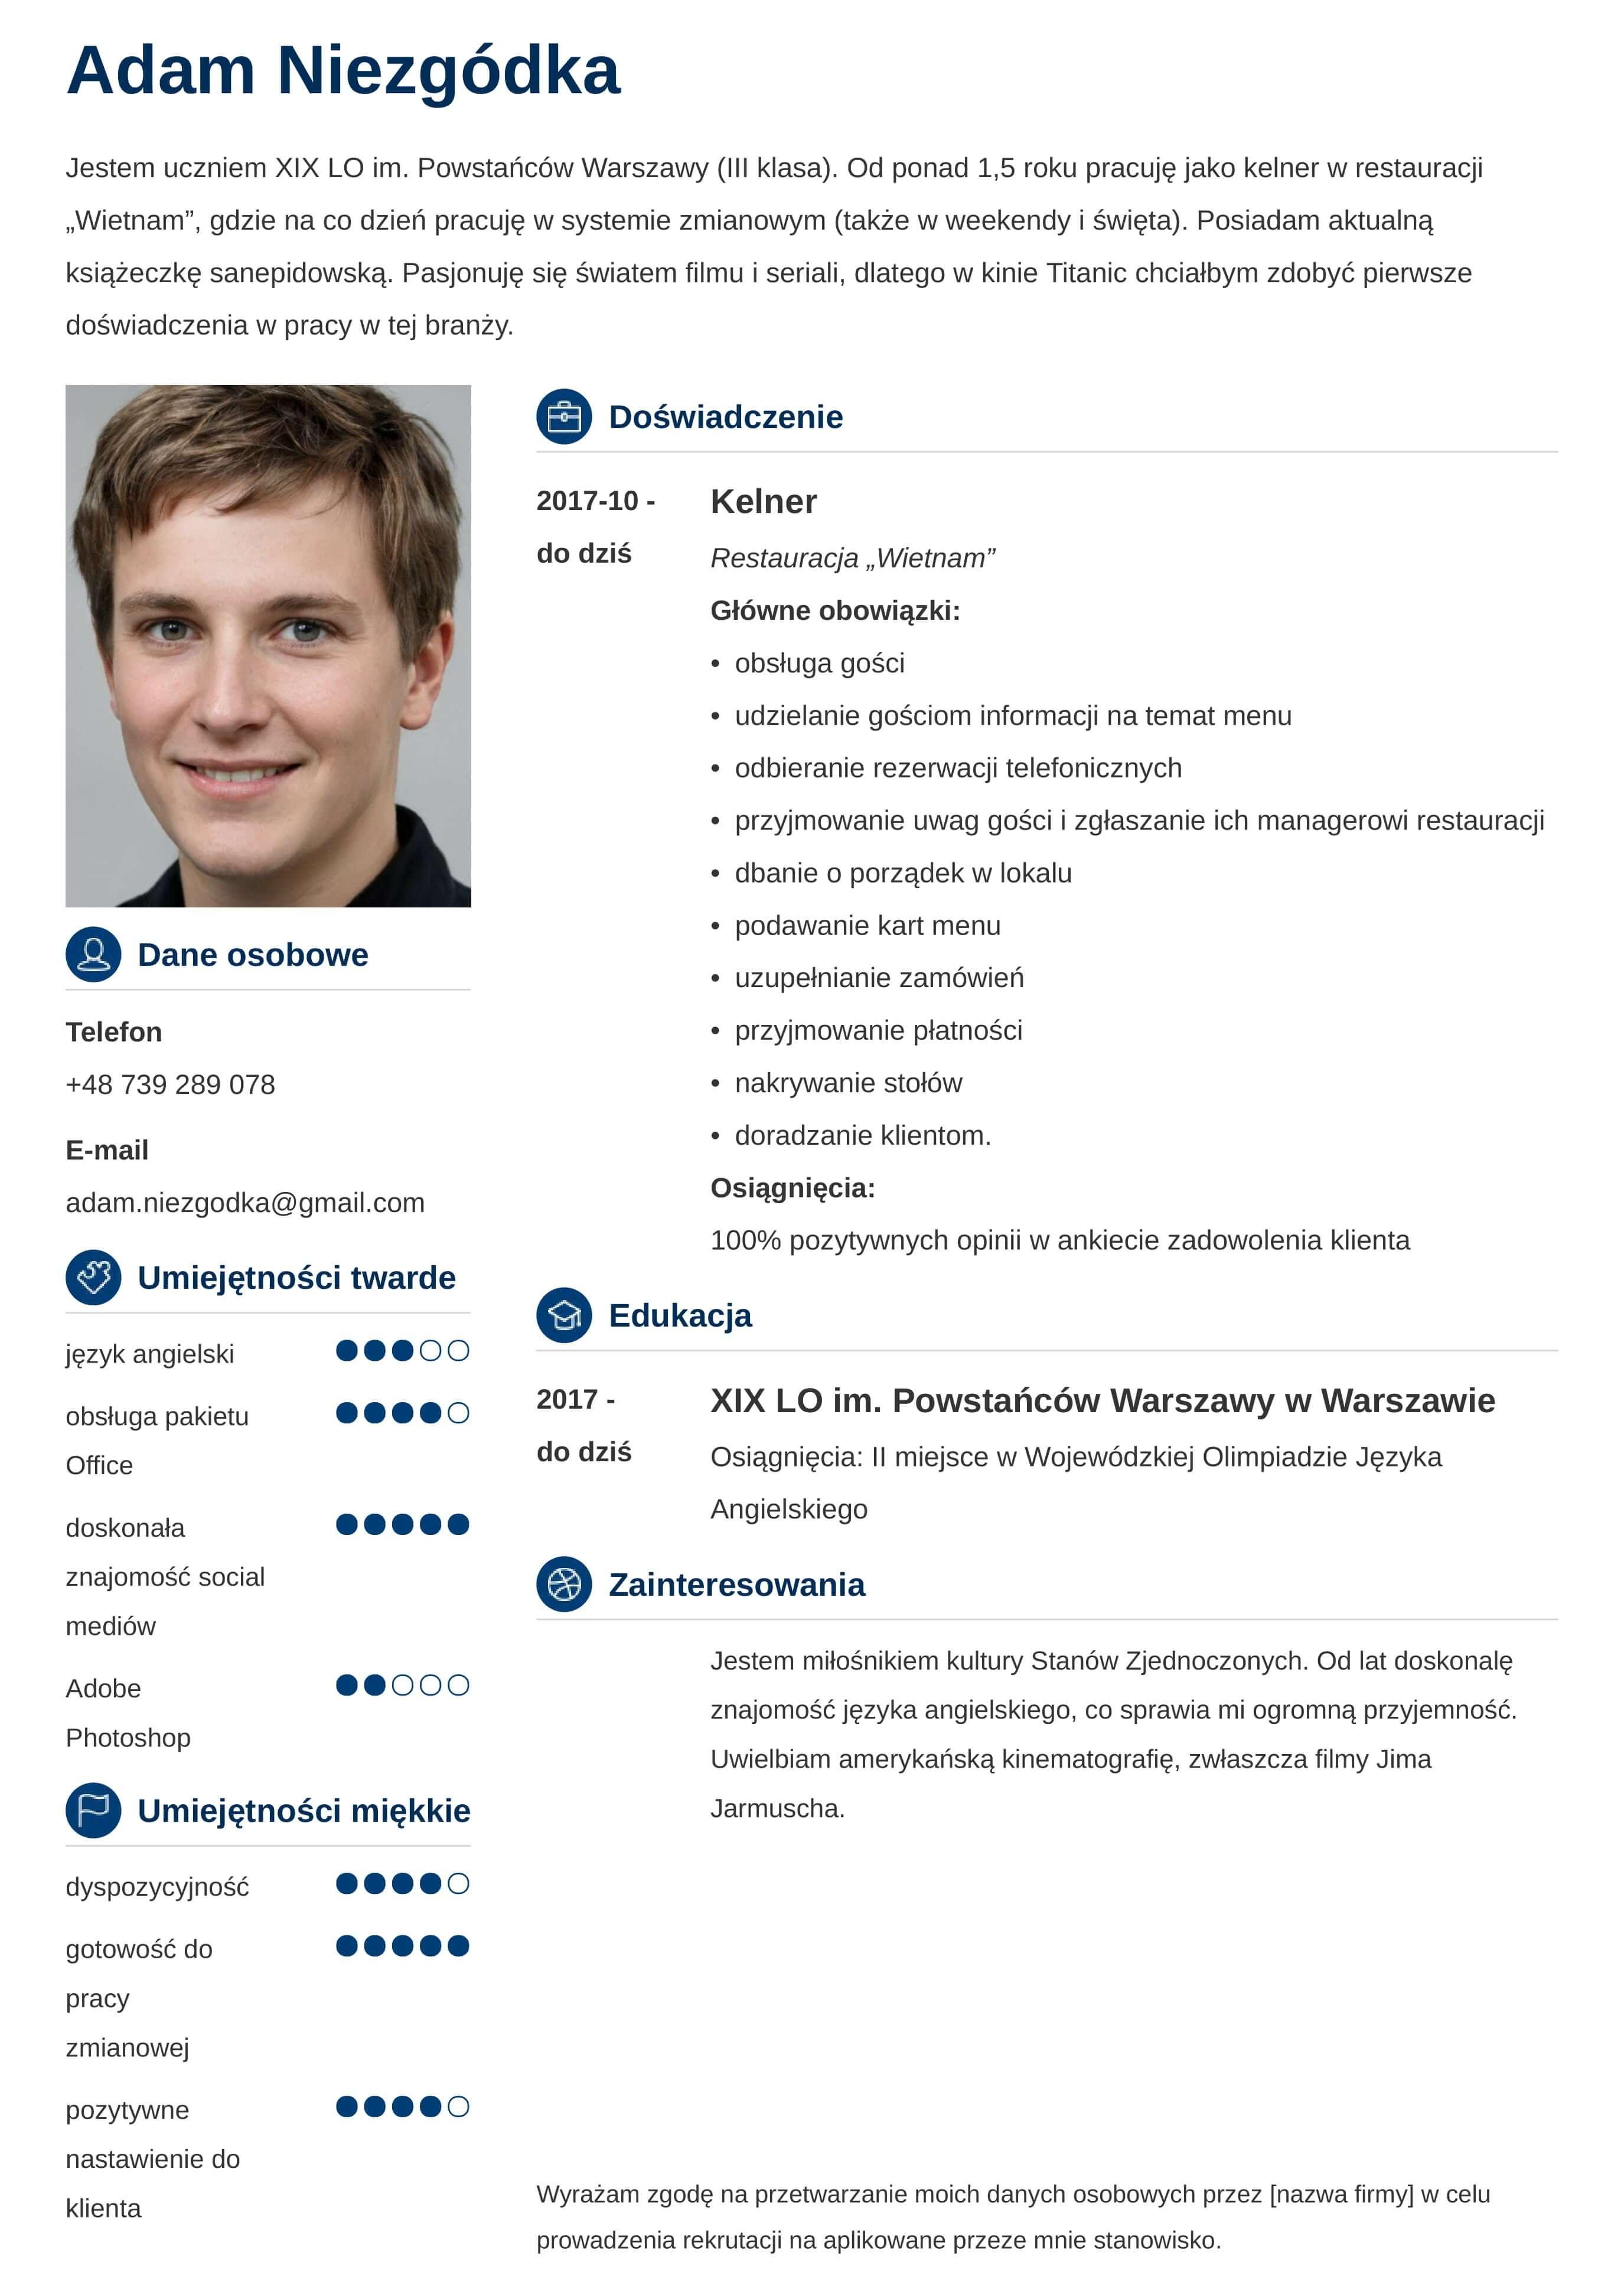 CV wzór dla ucznia